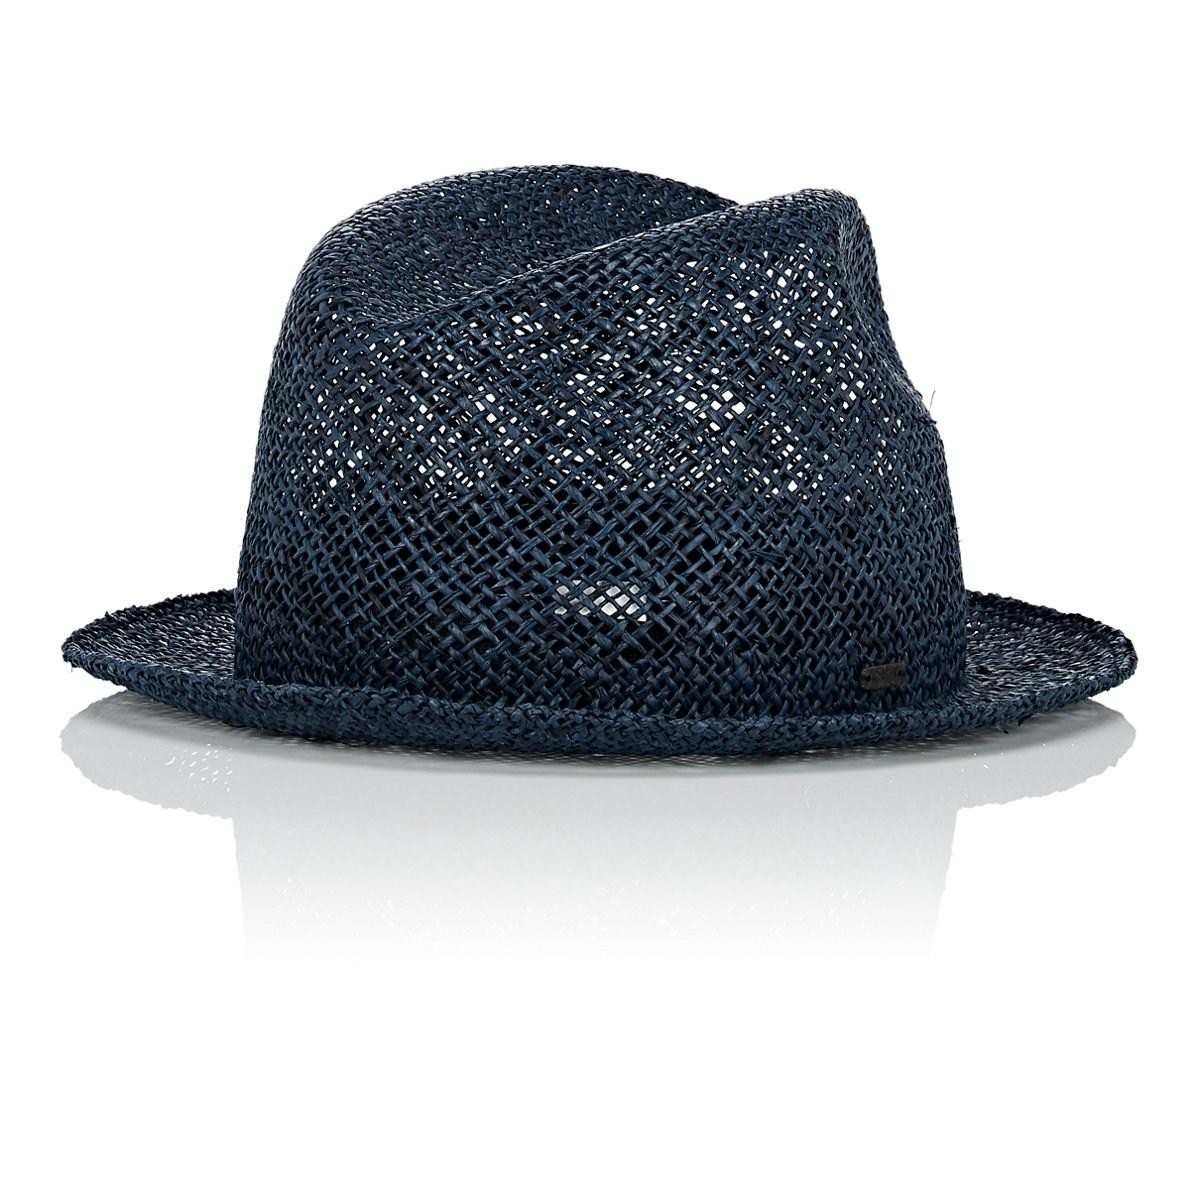 4250d6b2d Lyst - CA4LA Trilby Straw Fedora in Blue for Men